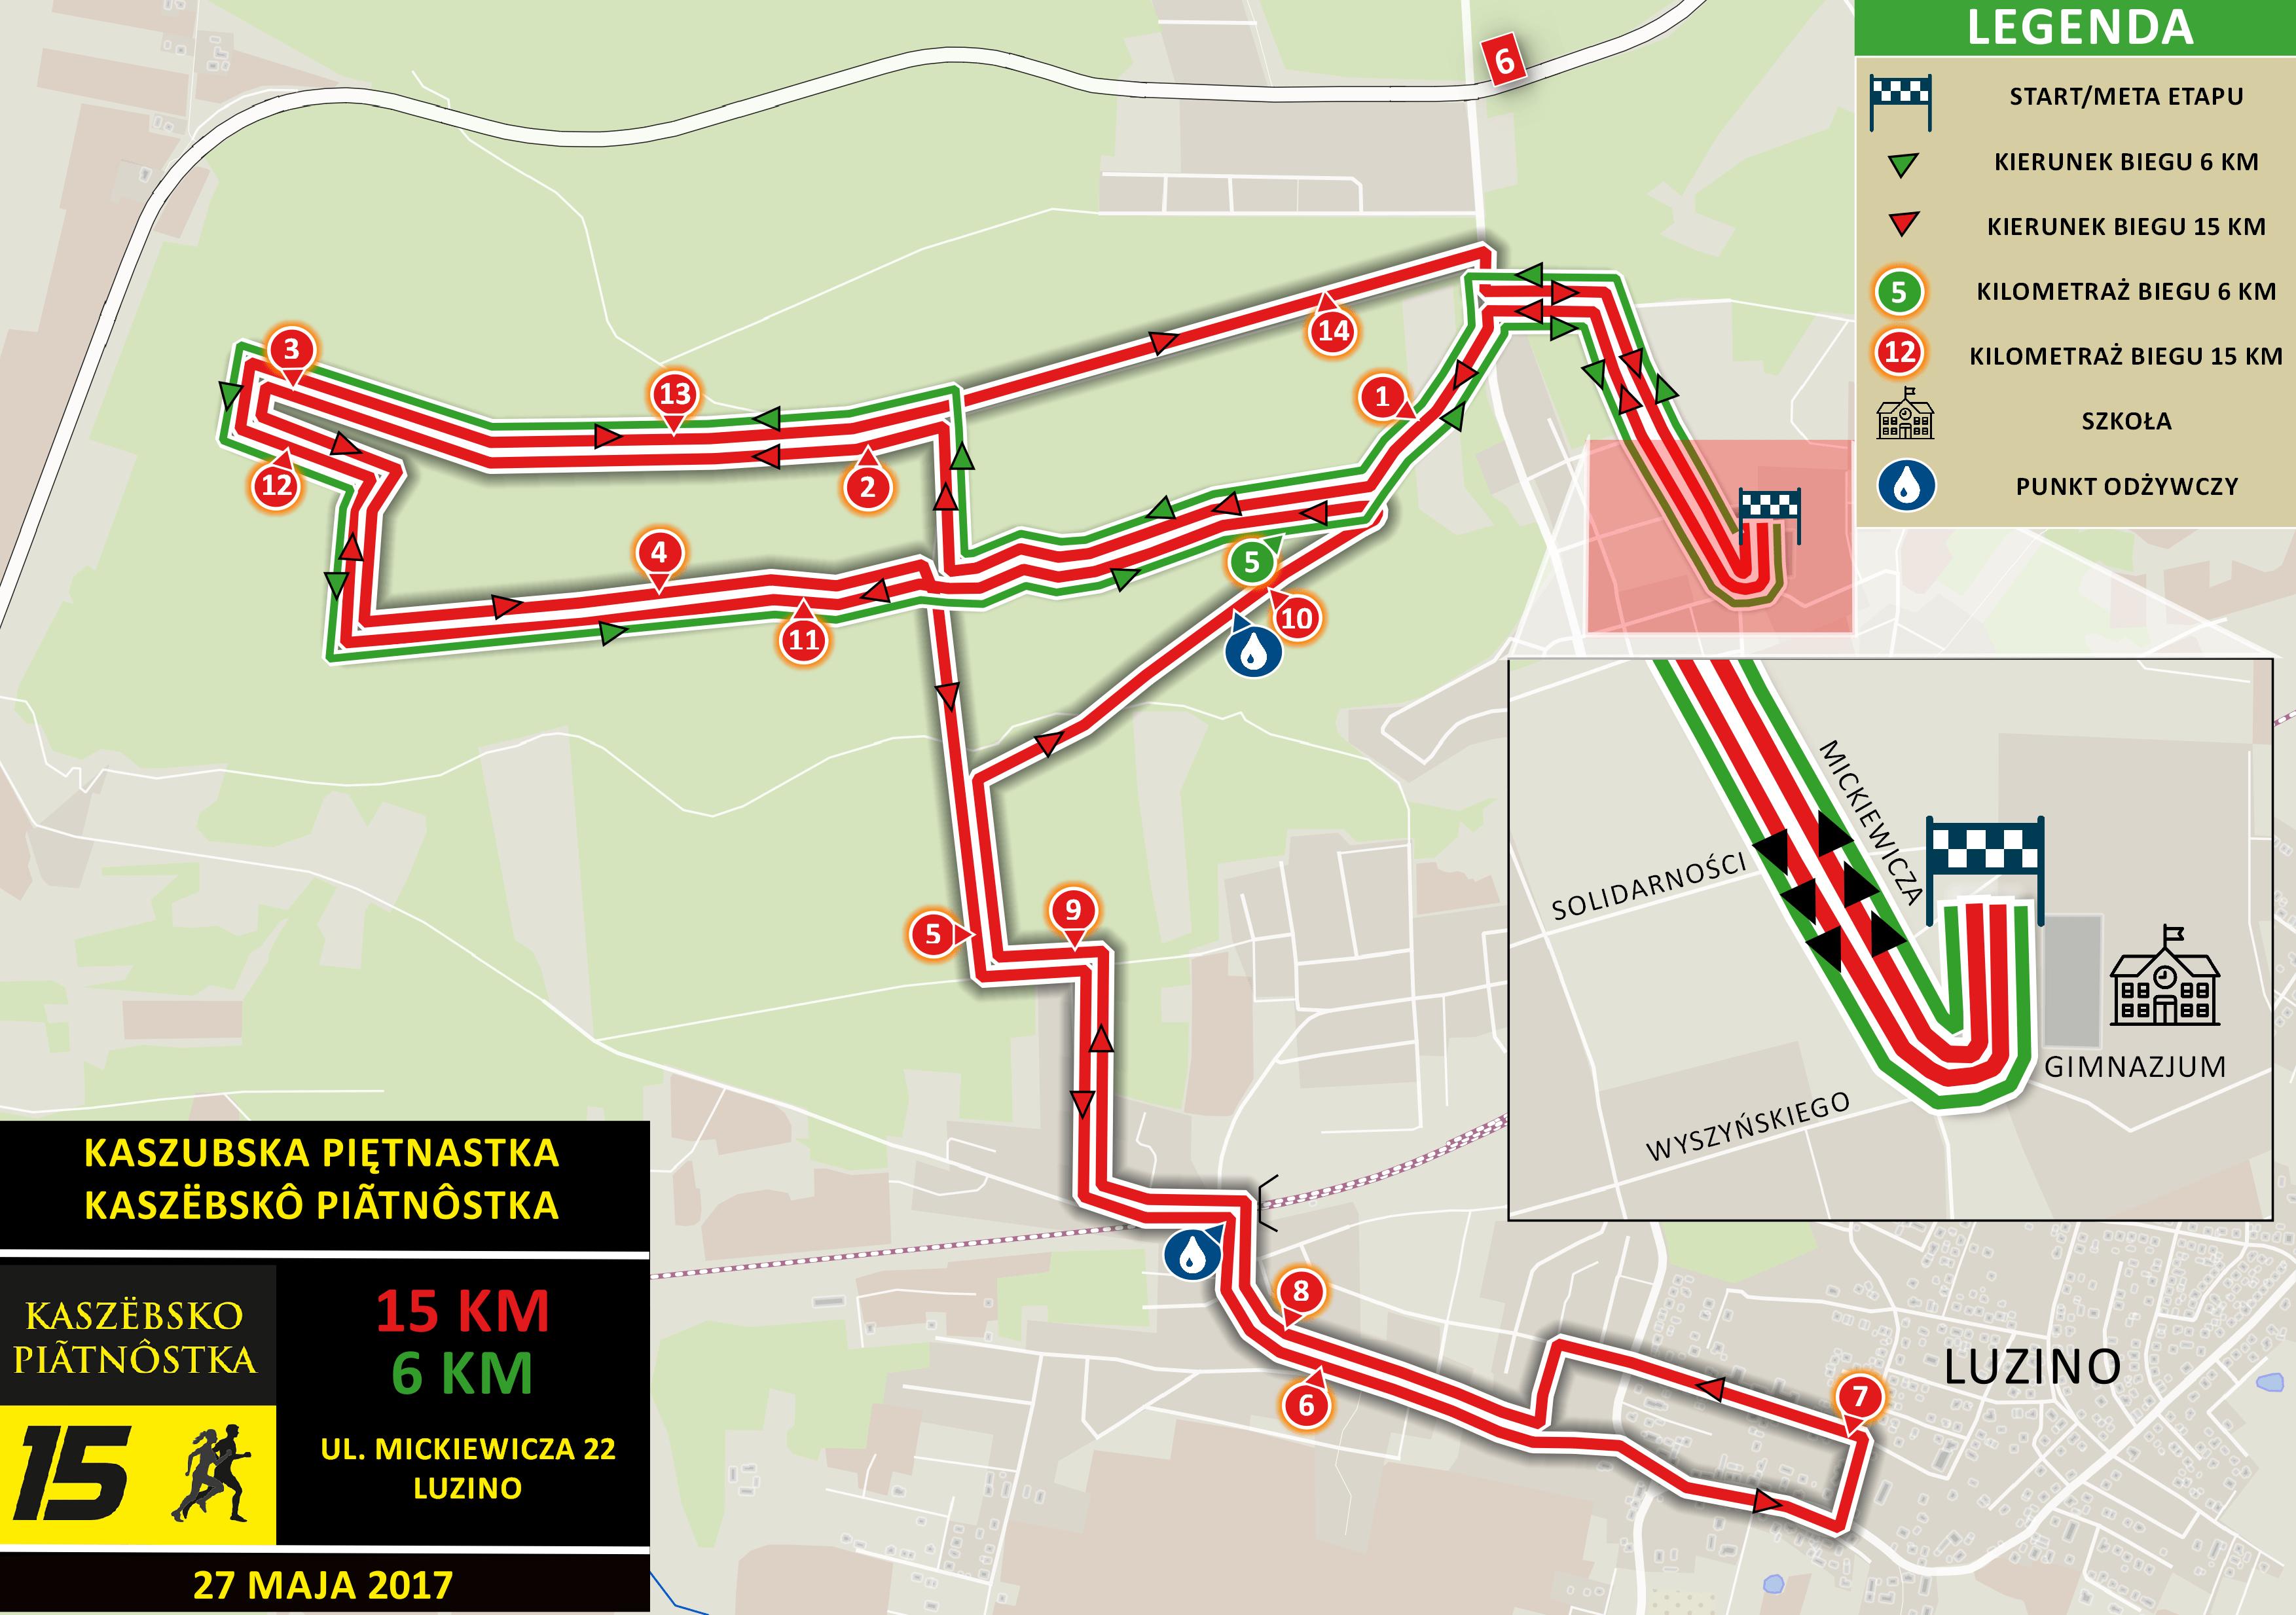 Kaszubska 15 - mapa NewsMap.pl (druk)